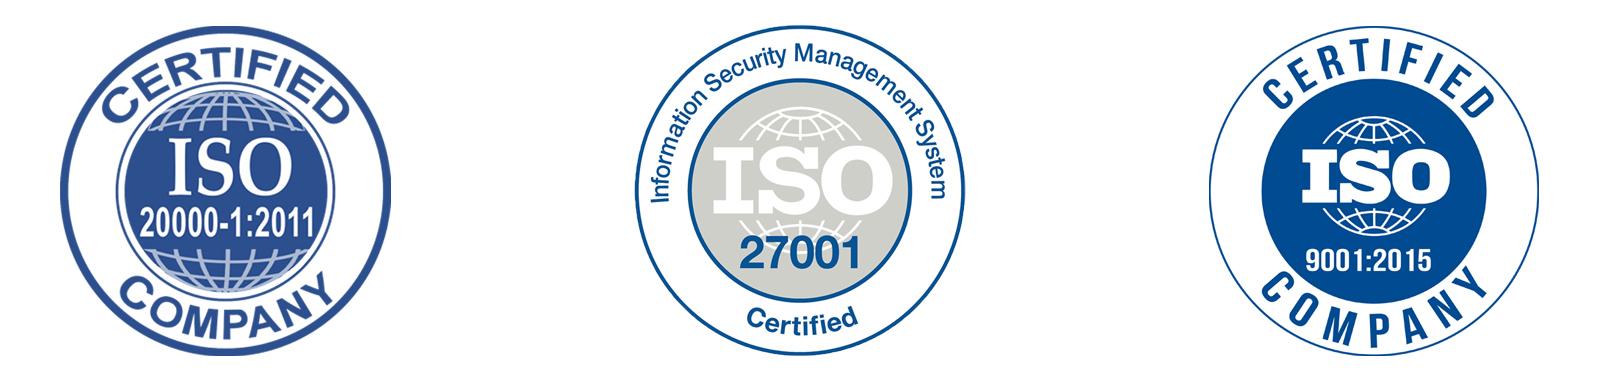 iso certificates 1